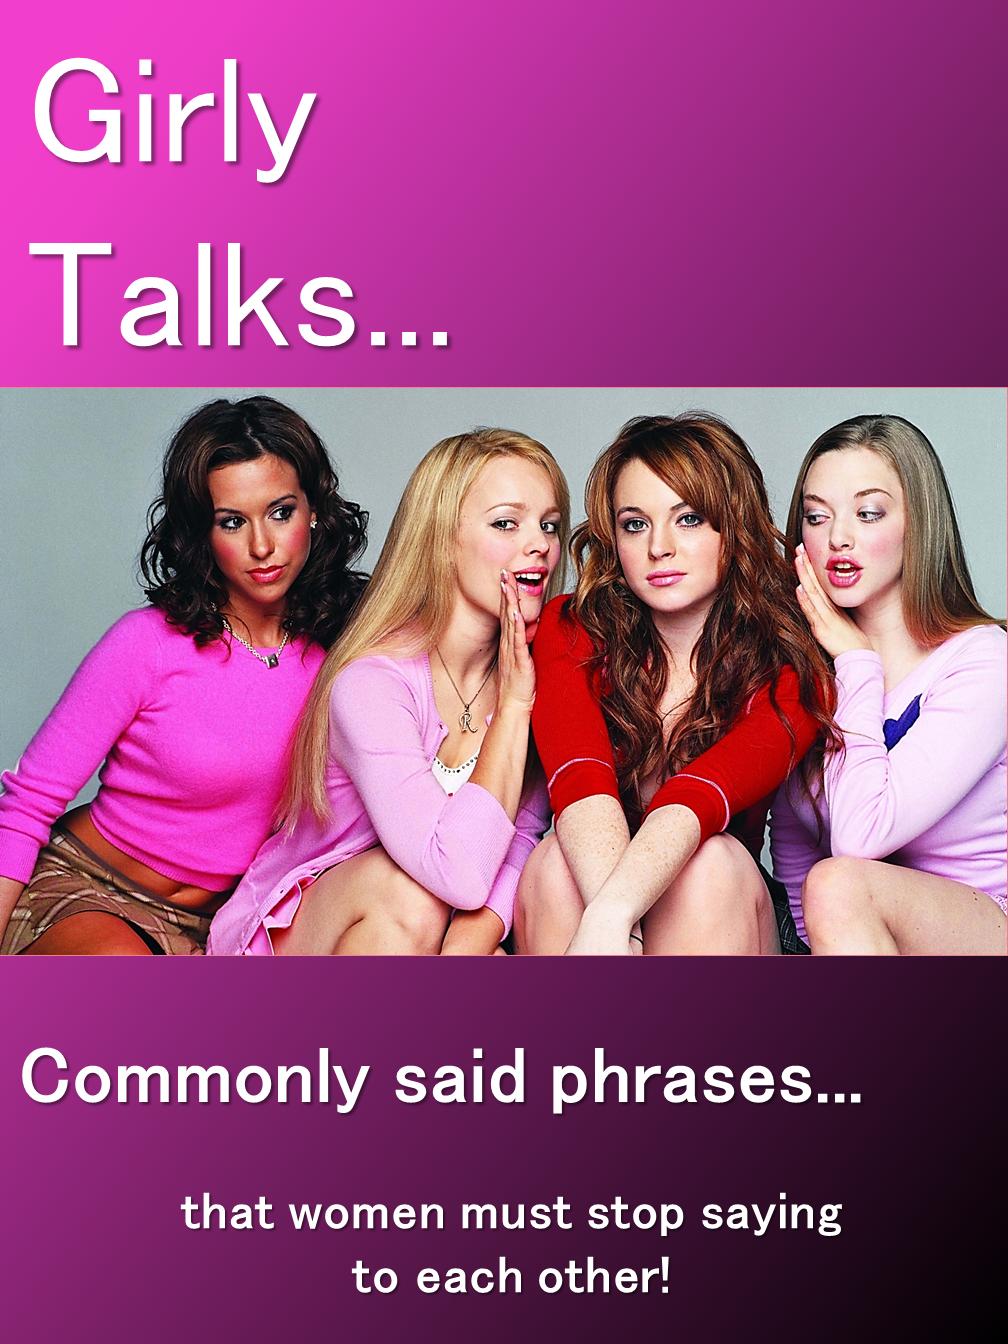 Girly Talks